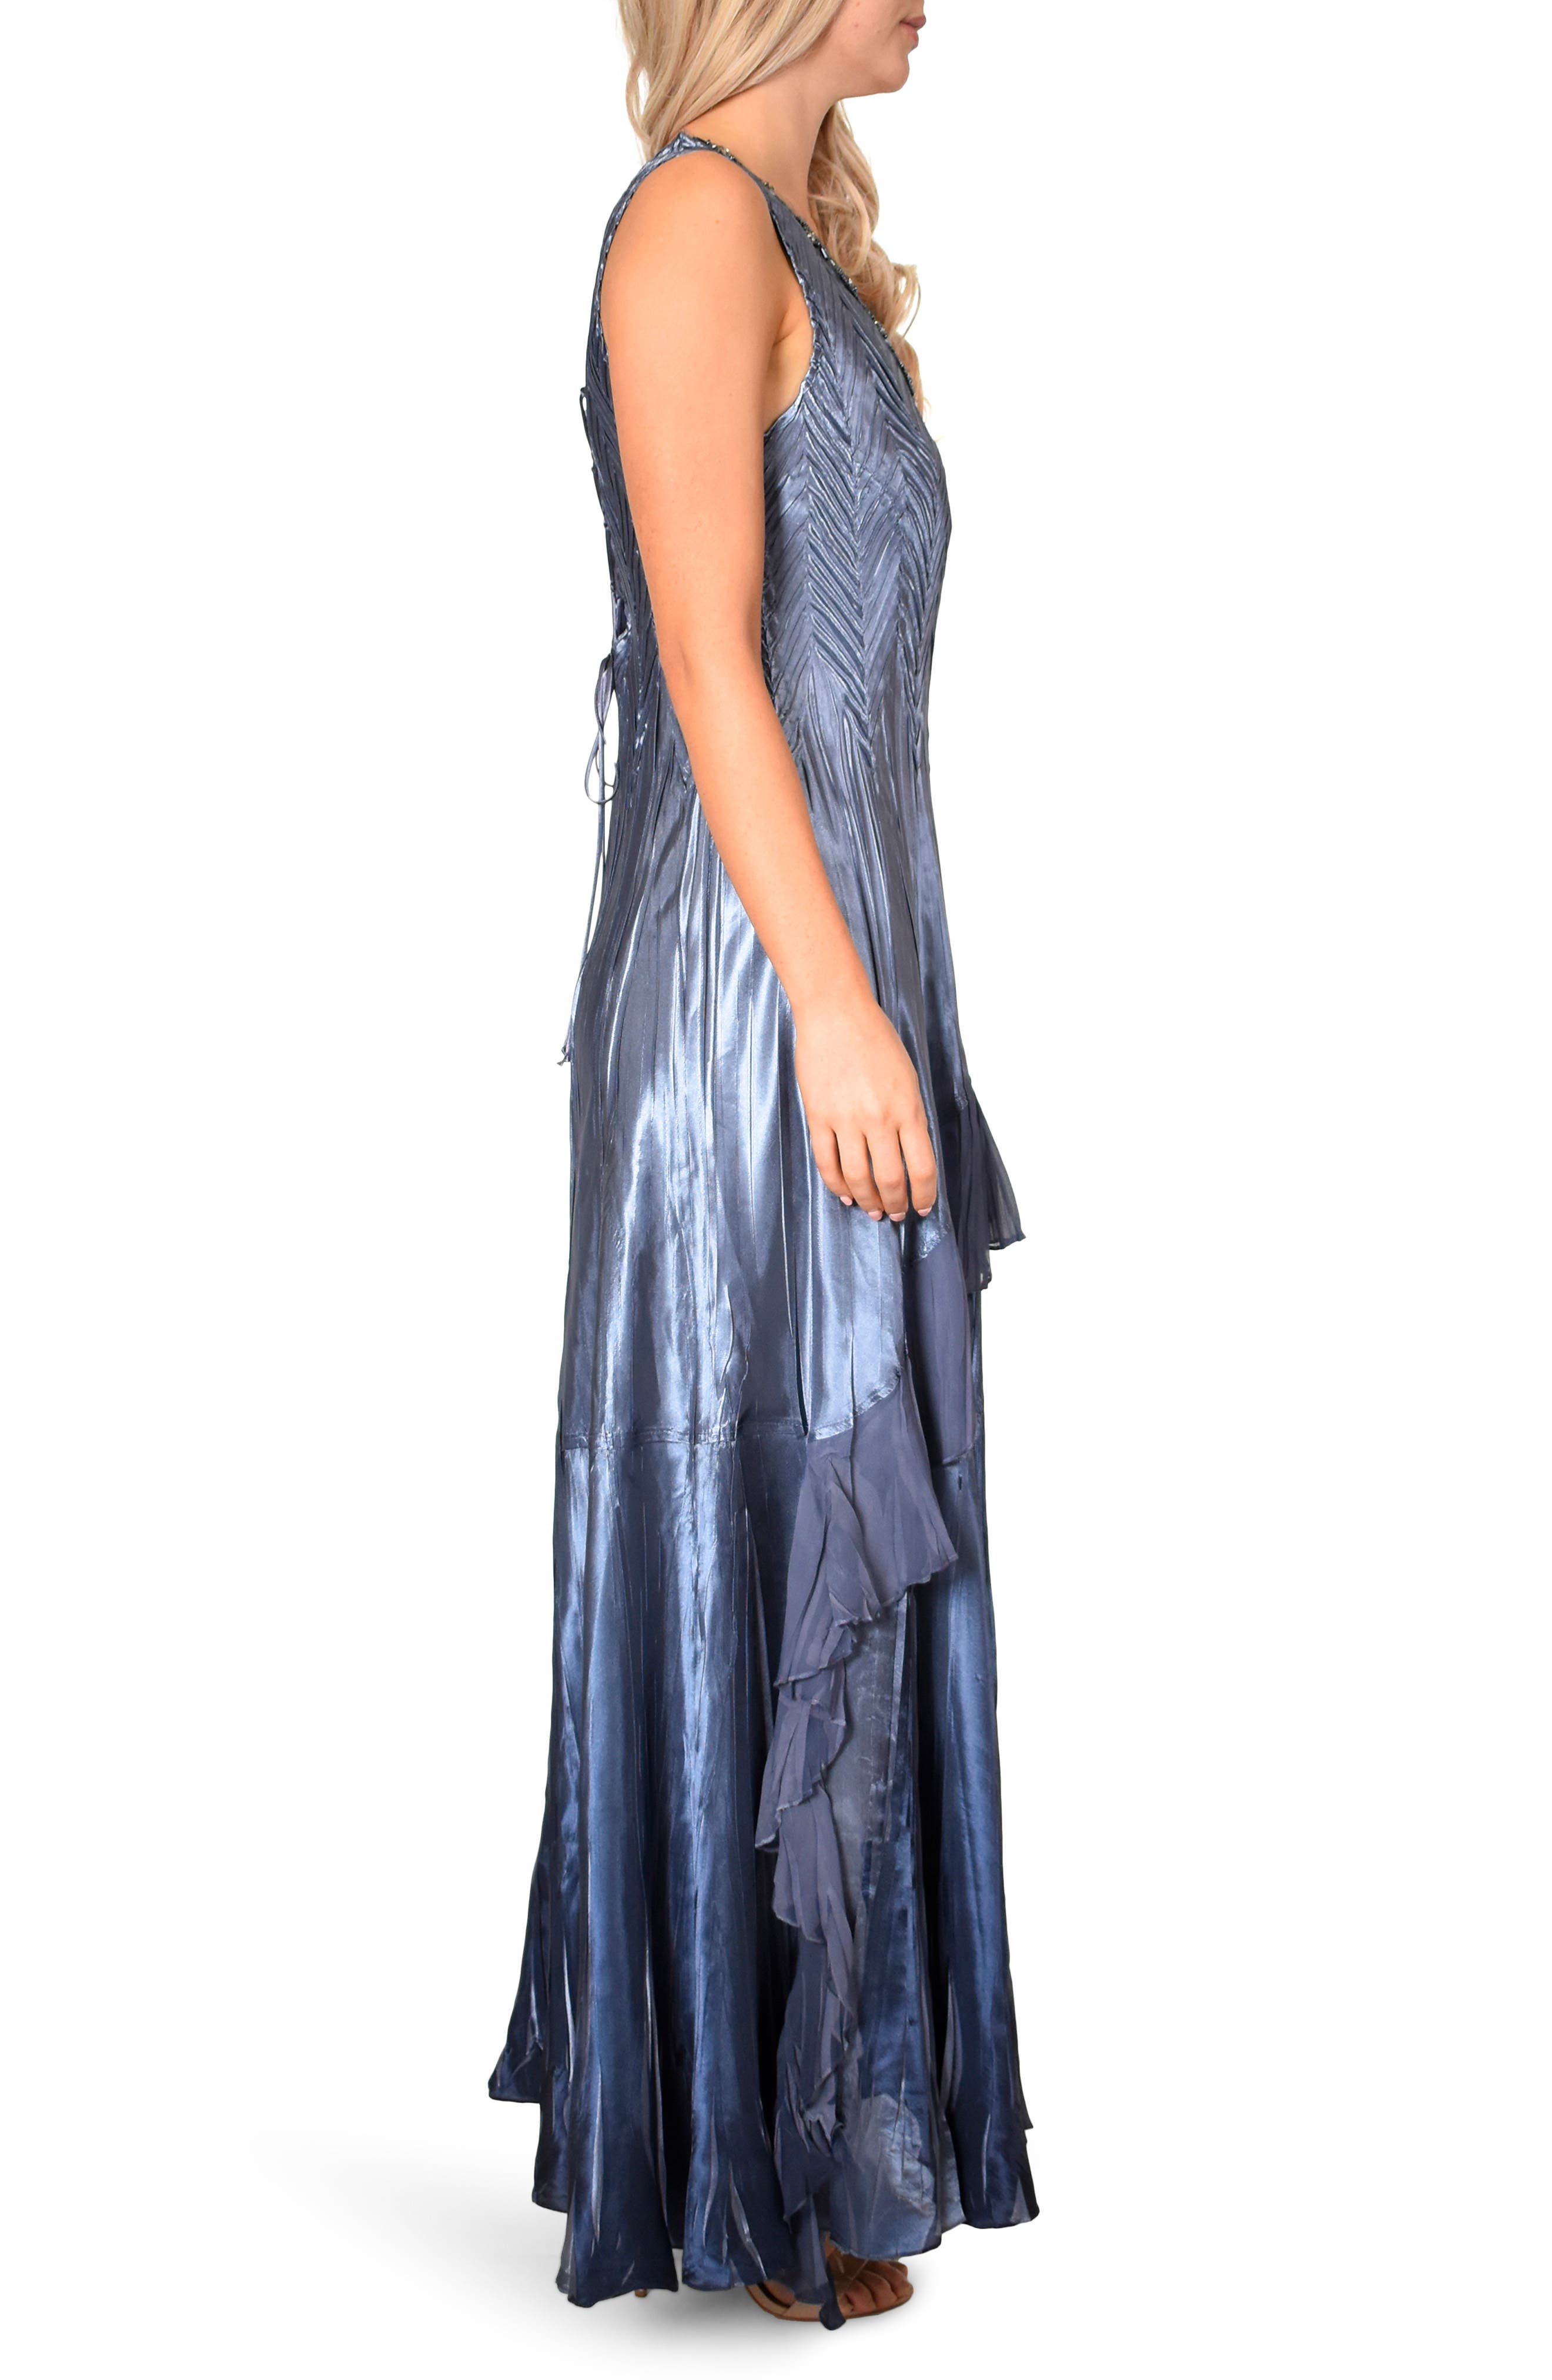 KOMAROV, Beaded V-Neck Charmeuse & Chiffon Evening Dress with Wrap, Alternate thumbnail 4, color, PURPLE SAGE BLUE OMBRE